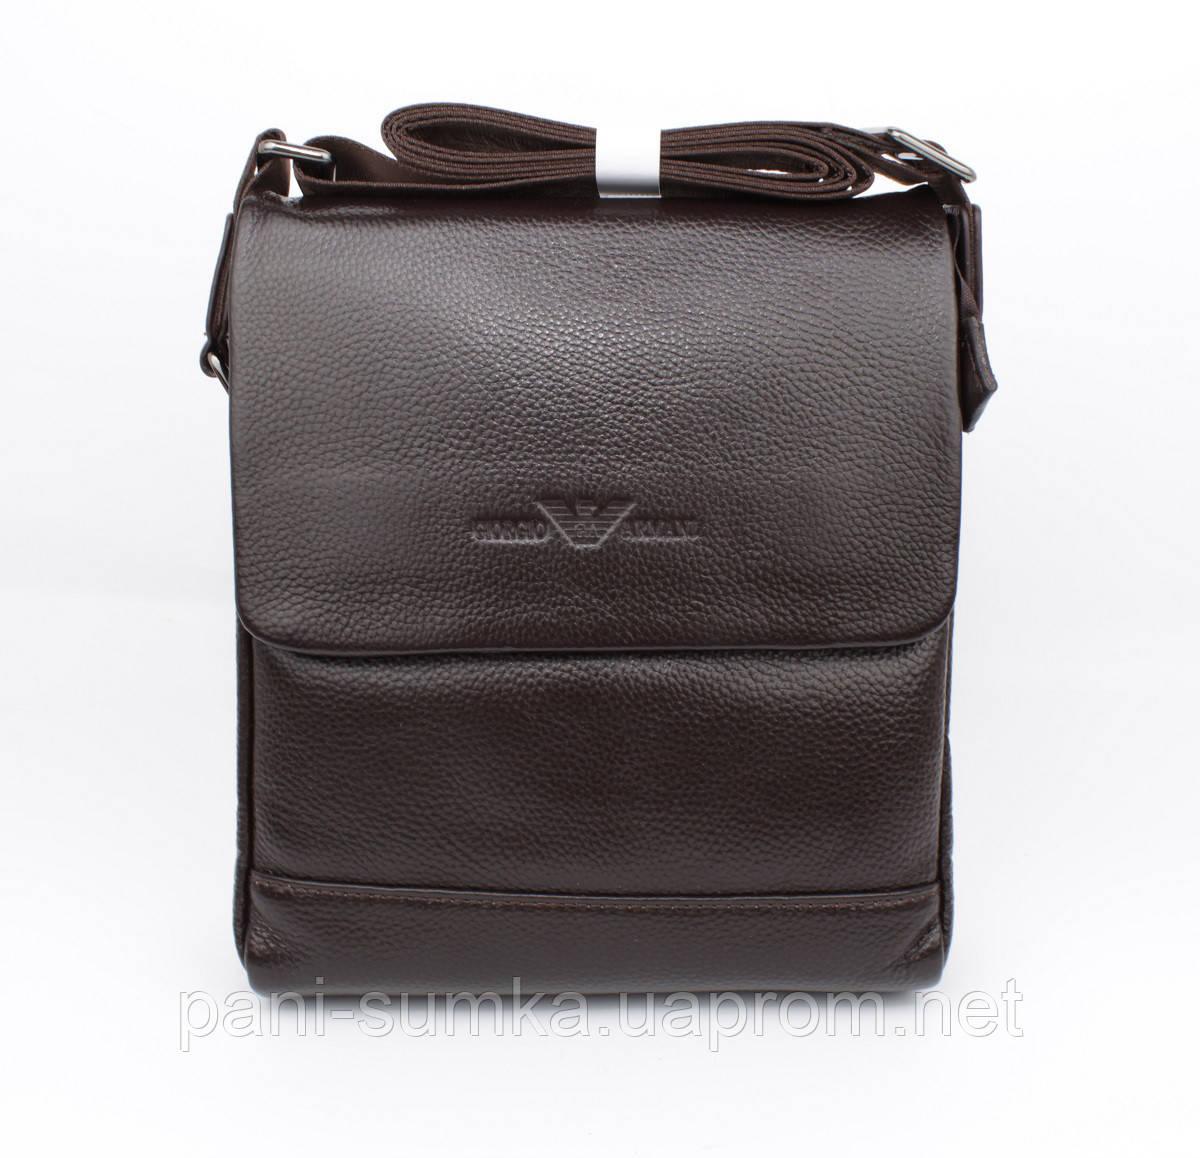 11a40bb66952 Сумка мужская кожаная Giorgio Armani 7911-3 коричневая: продажа ...